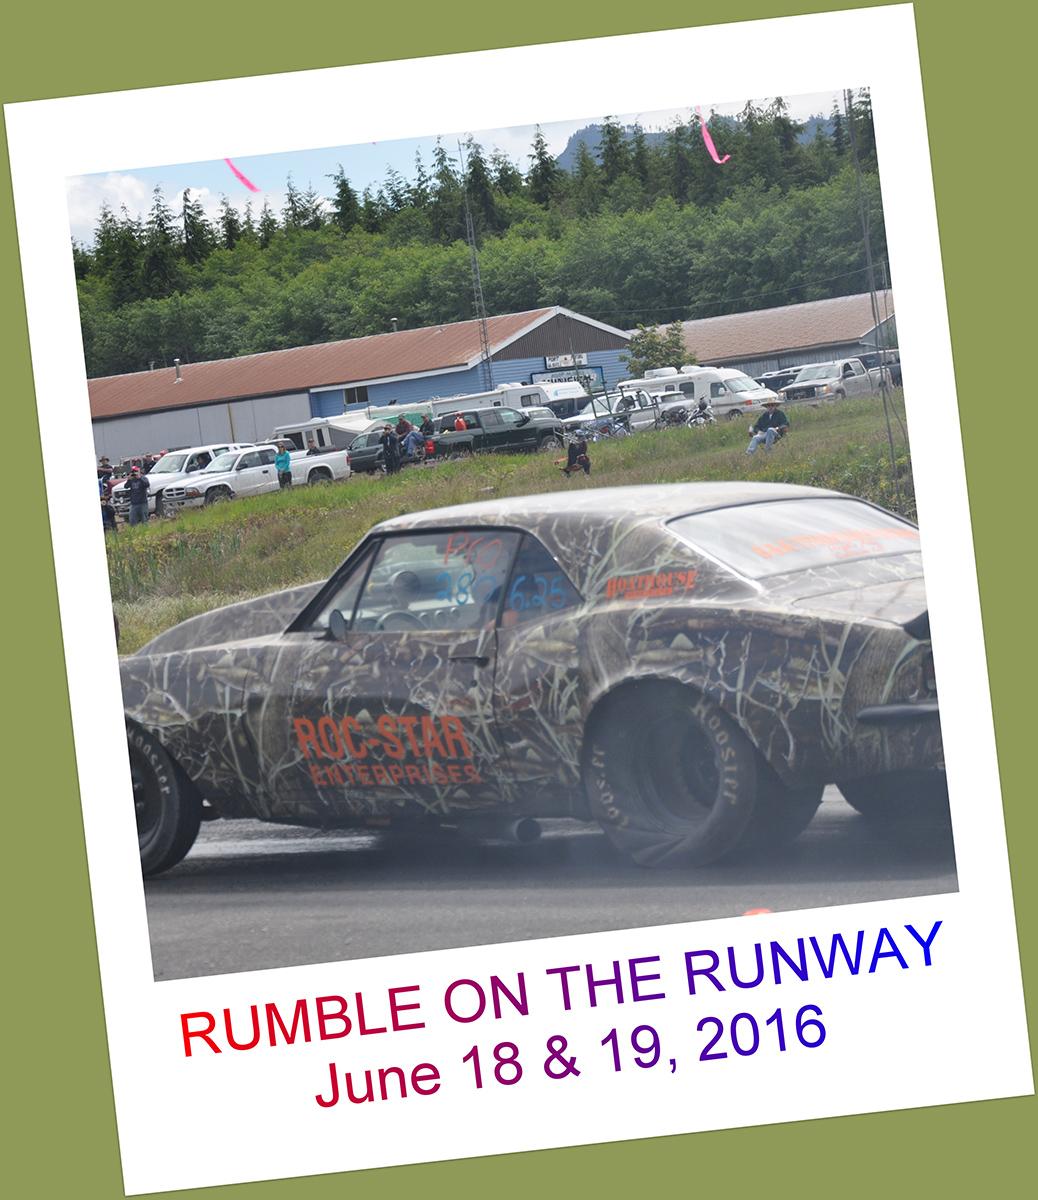 Rumble on the Runway June 18 & 19, 2016 664